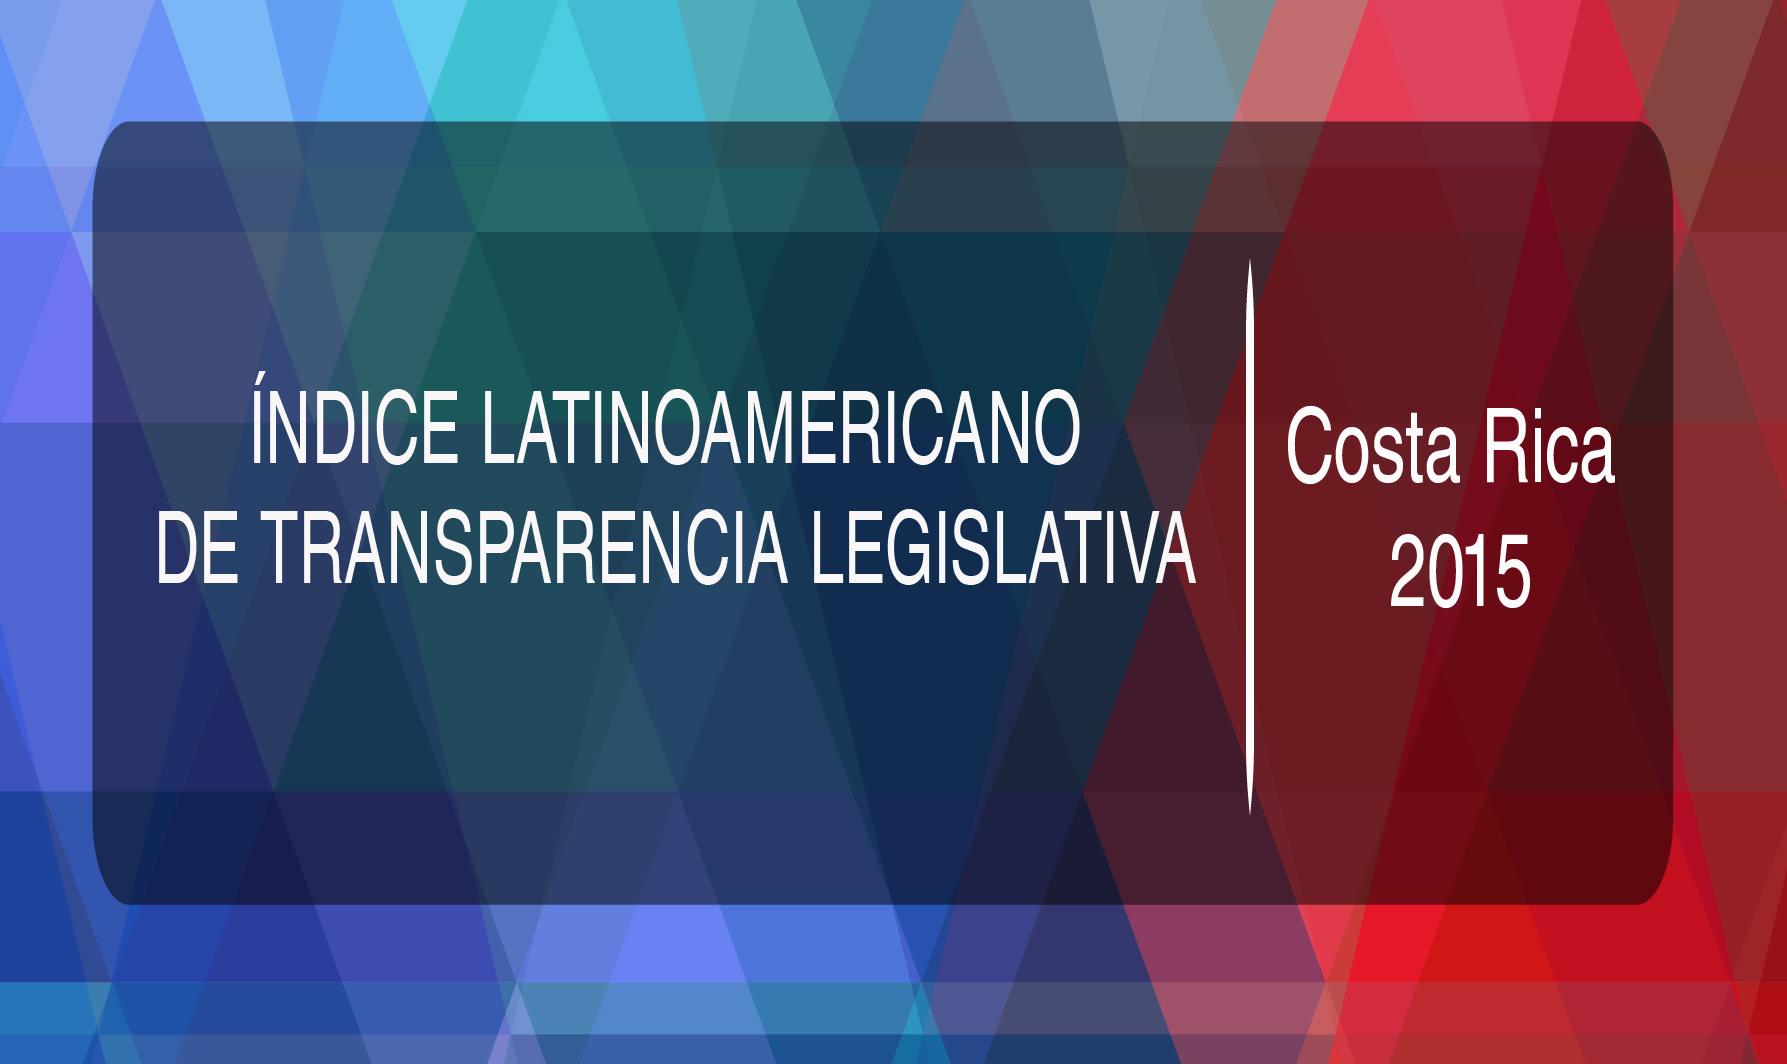 Índice Latinoamericano De Transparencia Legislativa Costa Rica